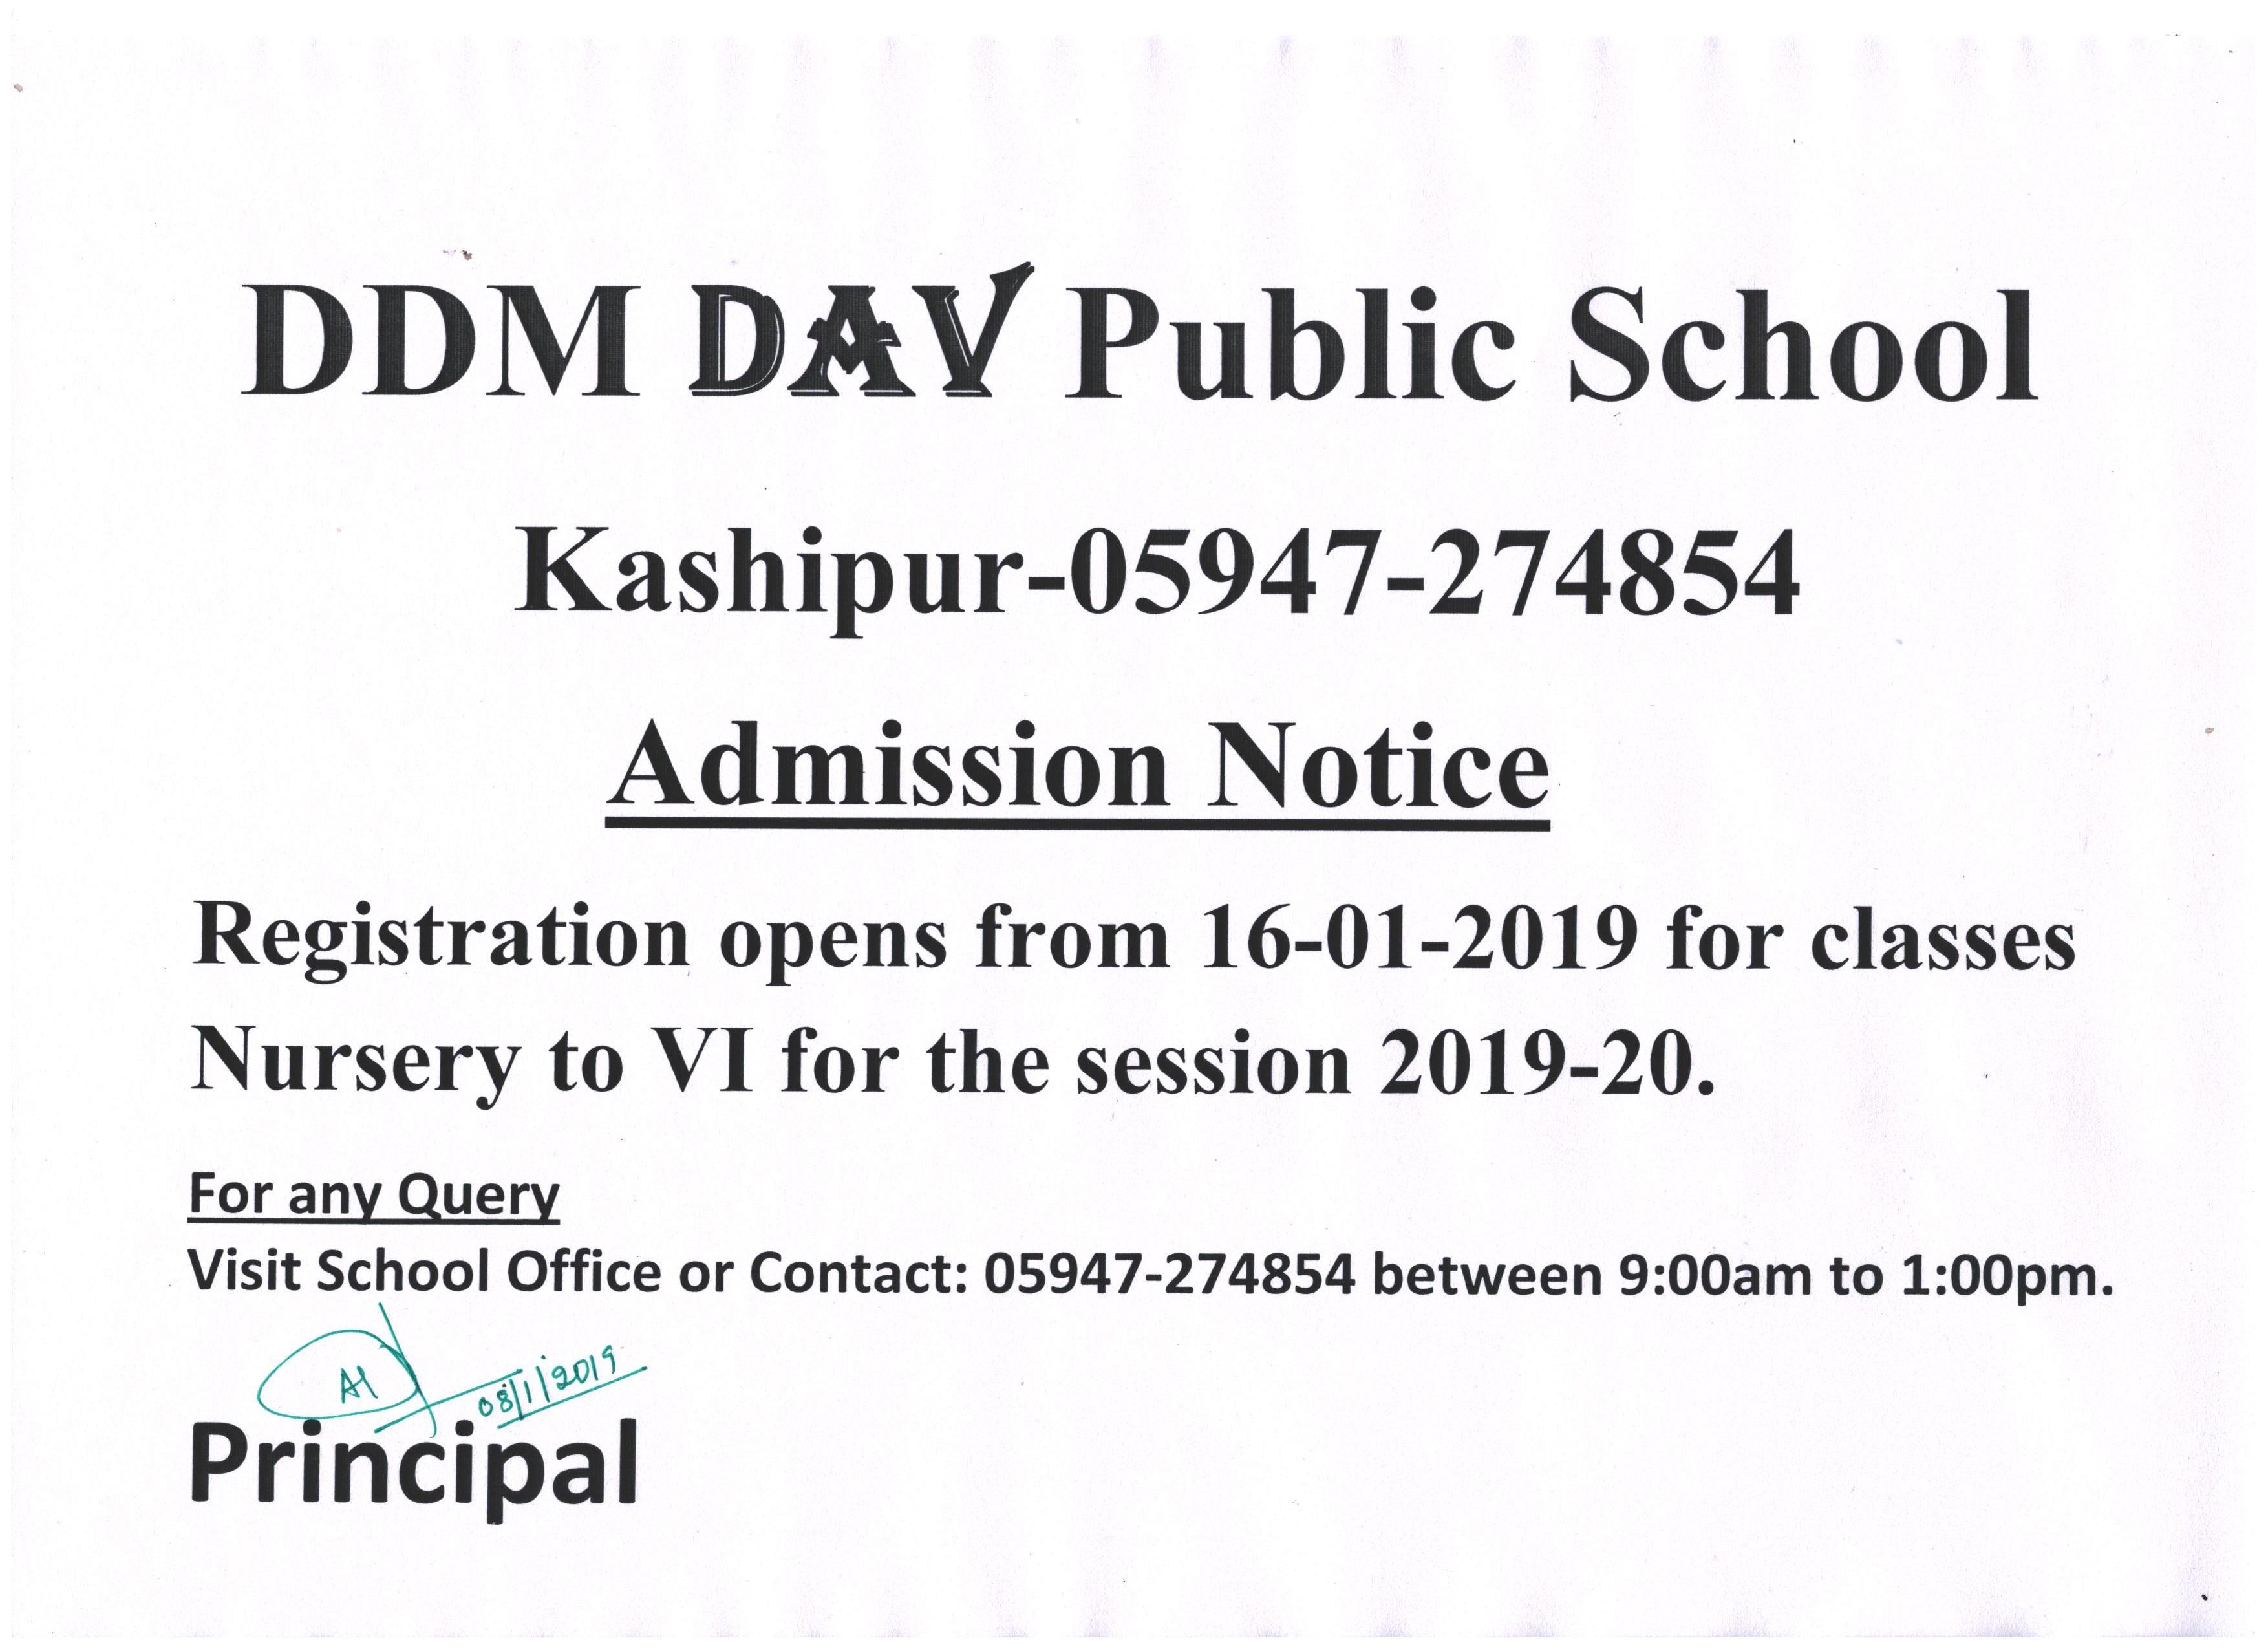 DDM DAV PUBLIC SCHOOL, KASHIPUR